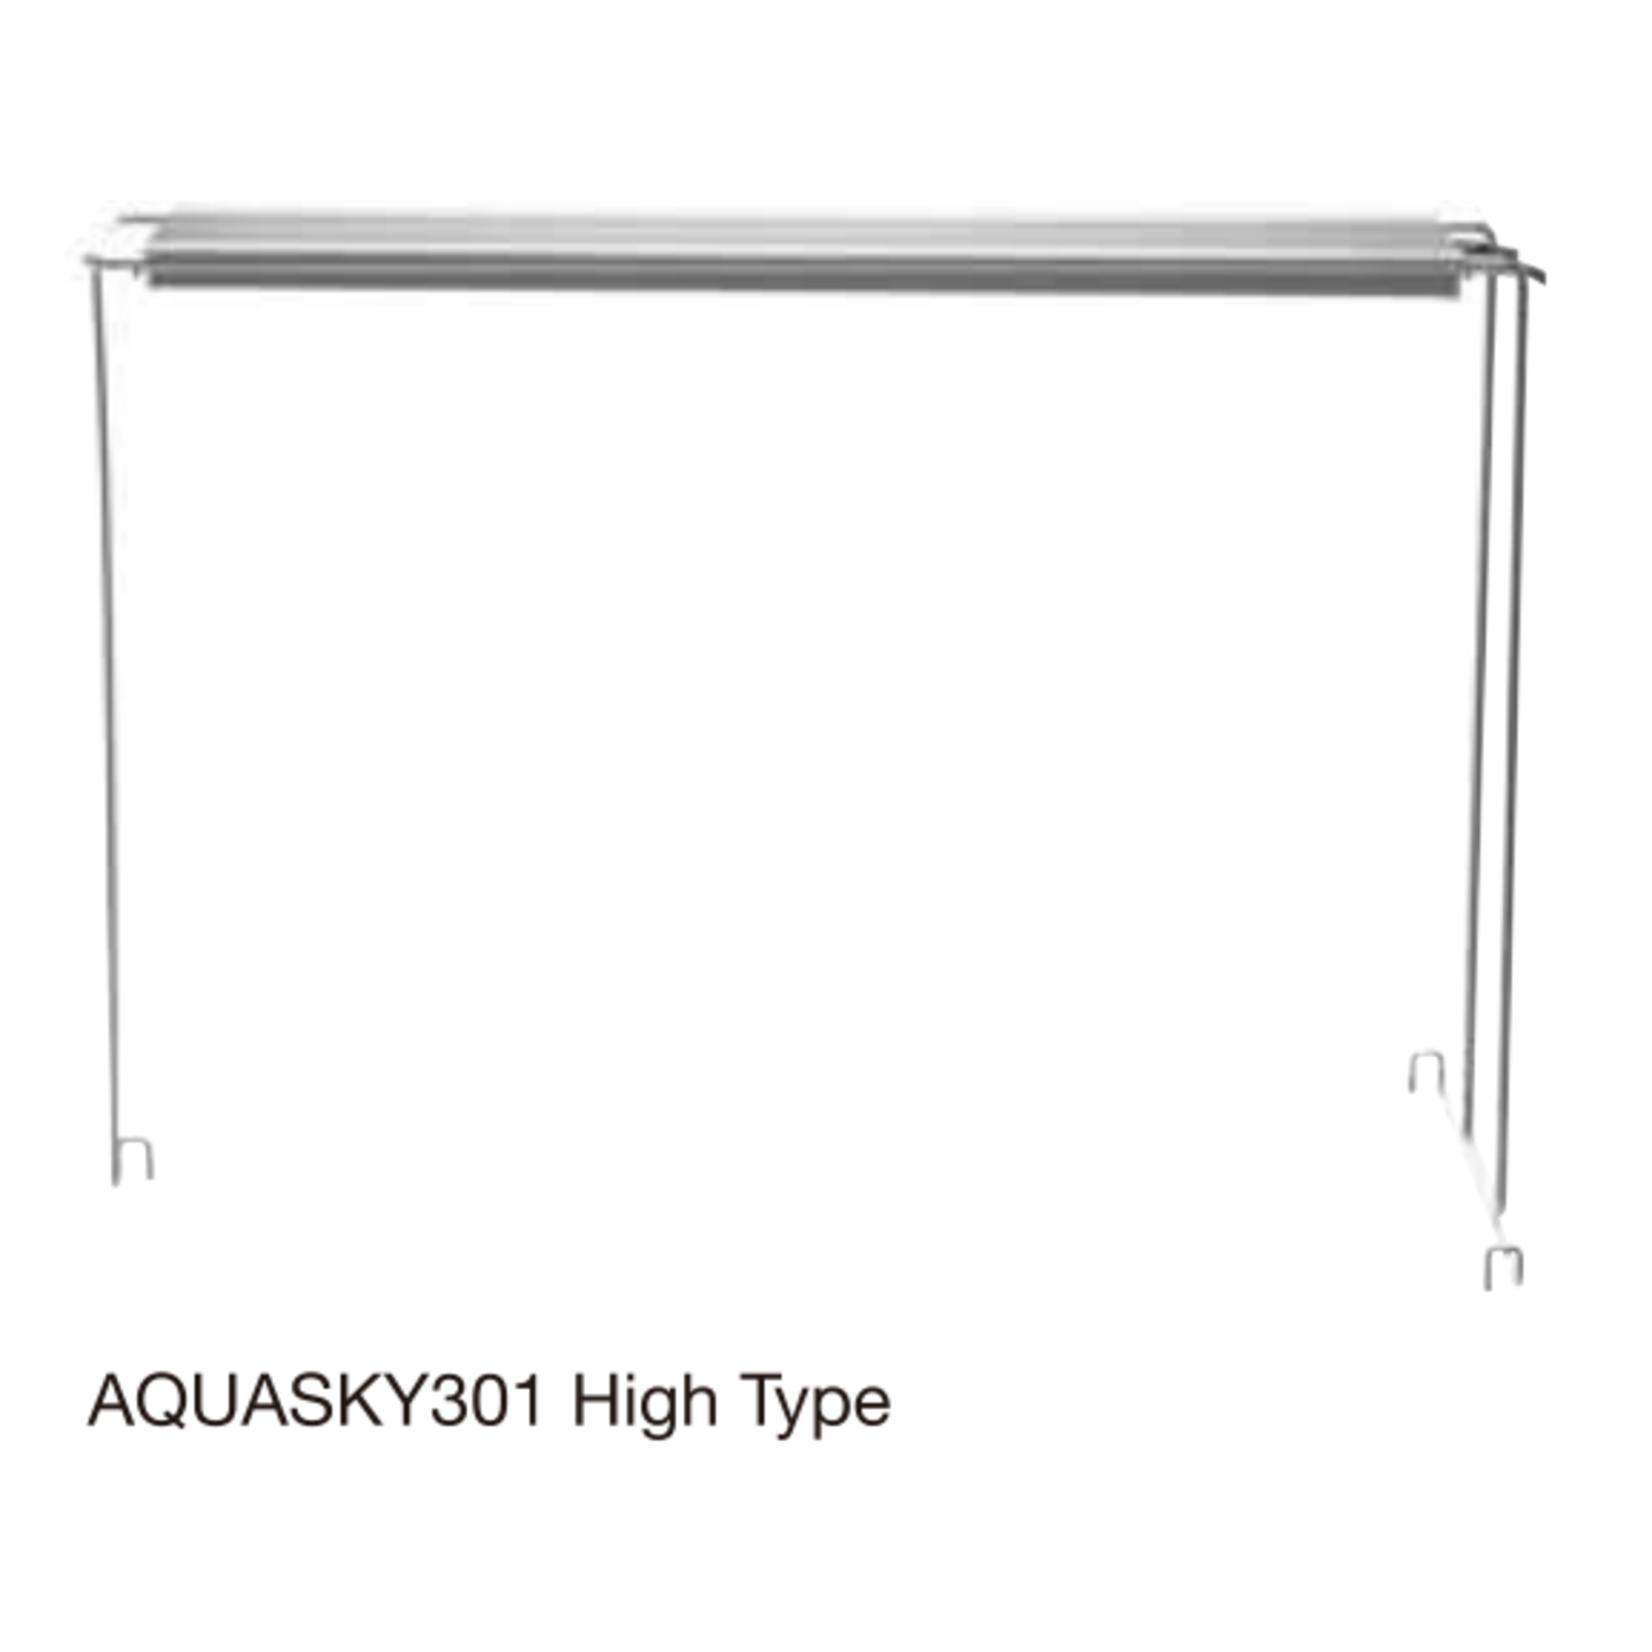 ADA AQUASKY G 301 High Type Stand